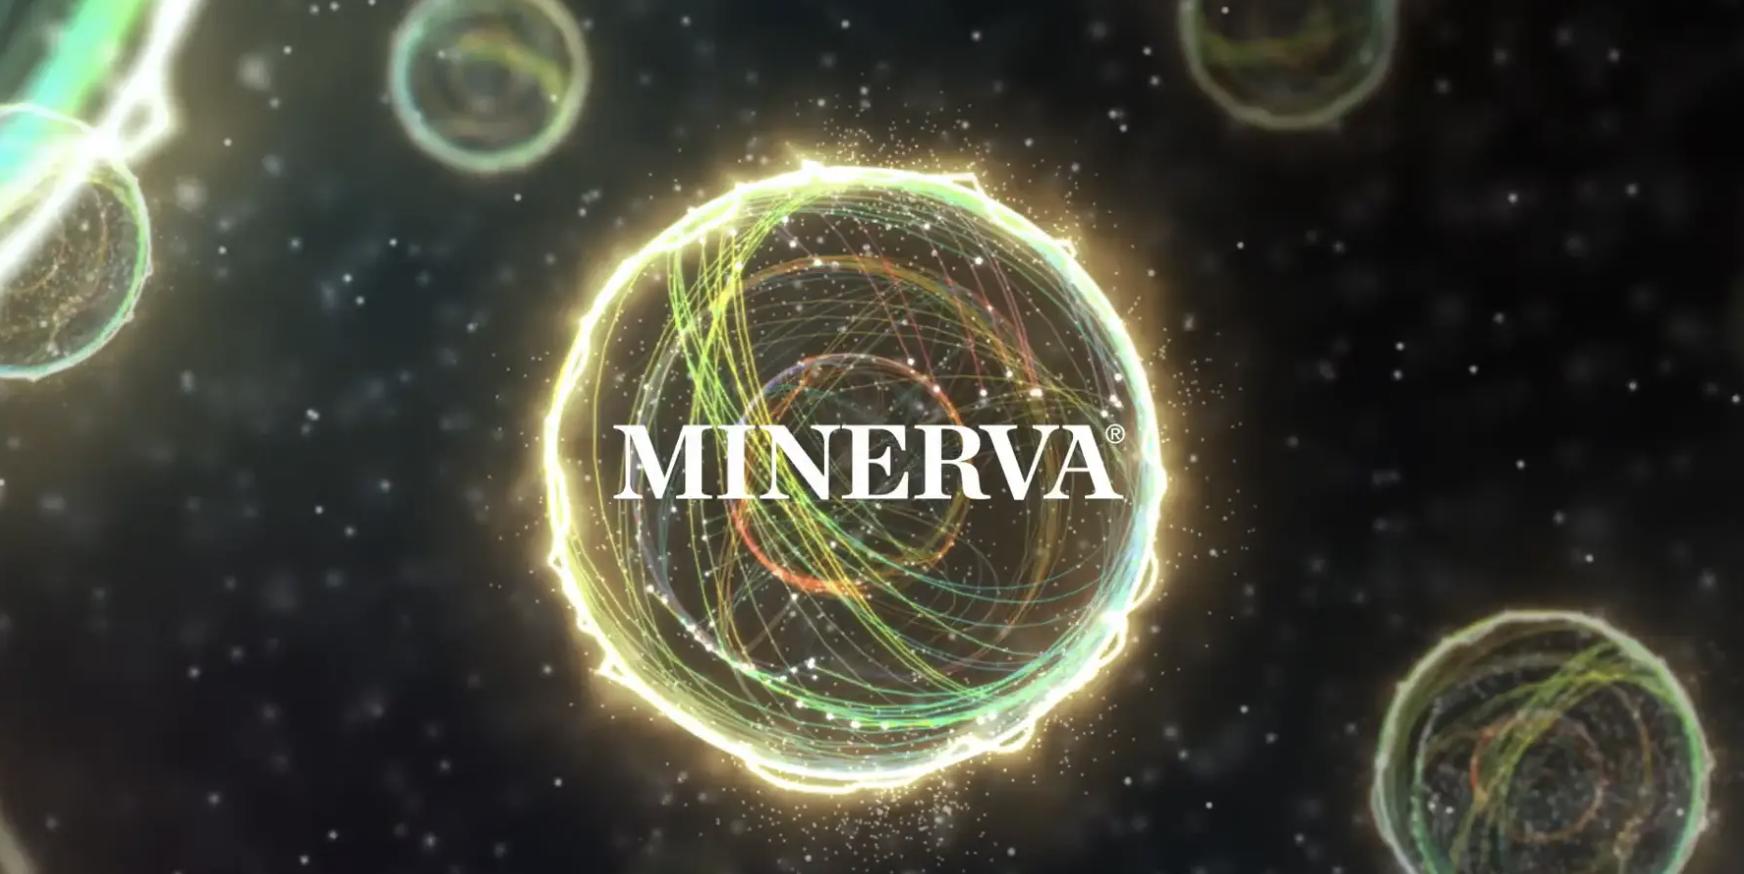 Minerva Baccalaureate